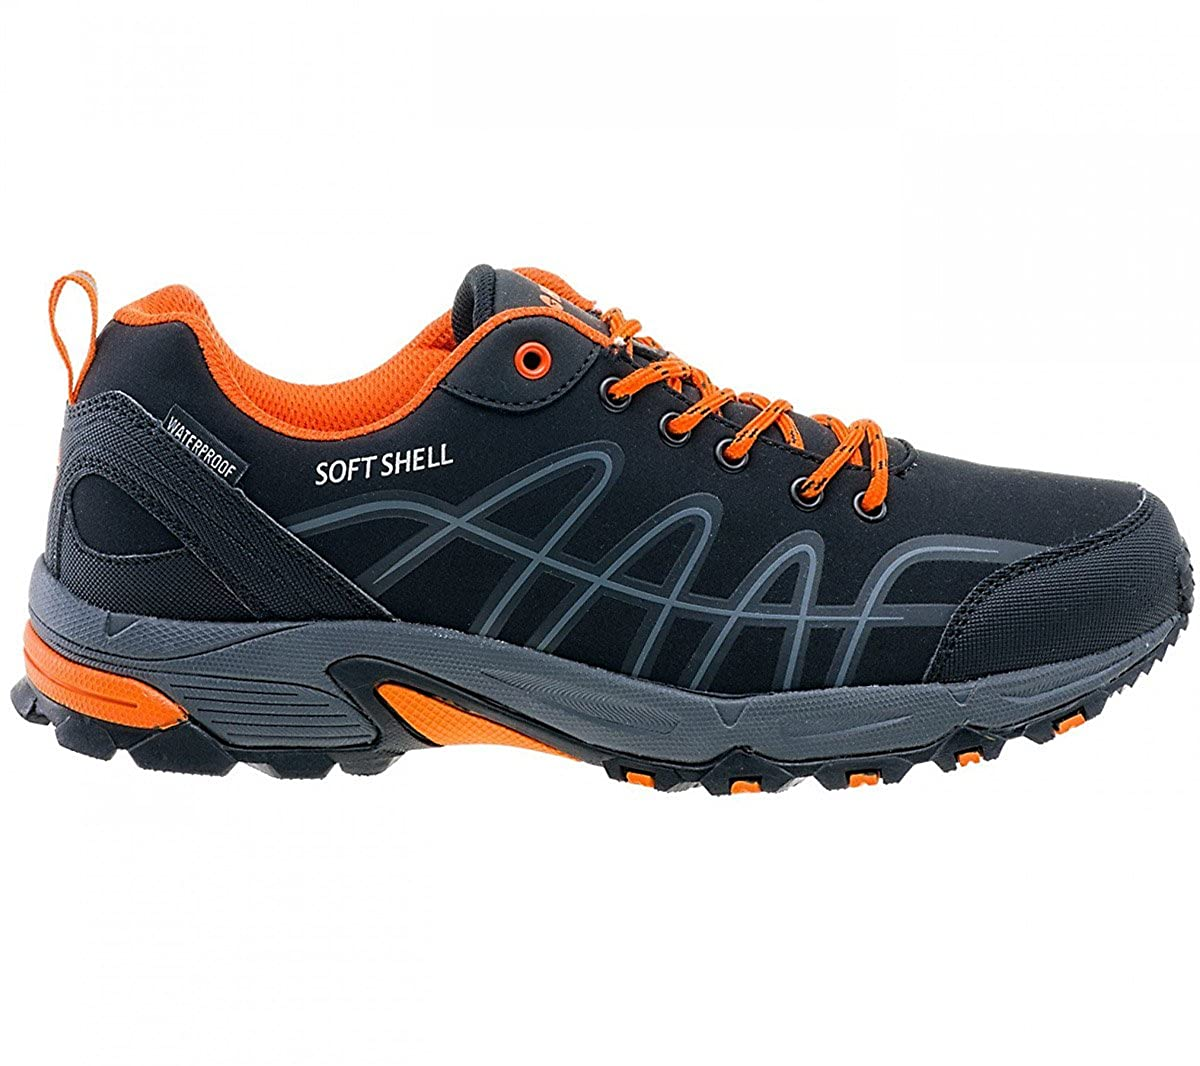 Hi-Tec Pamio Low WP Herren Outdoor Wanderschuhe Schuhe Schwarz-Orange Trekking Trail Waterproof Wasserdicht